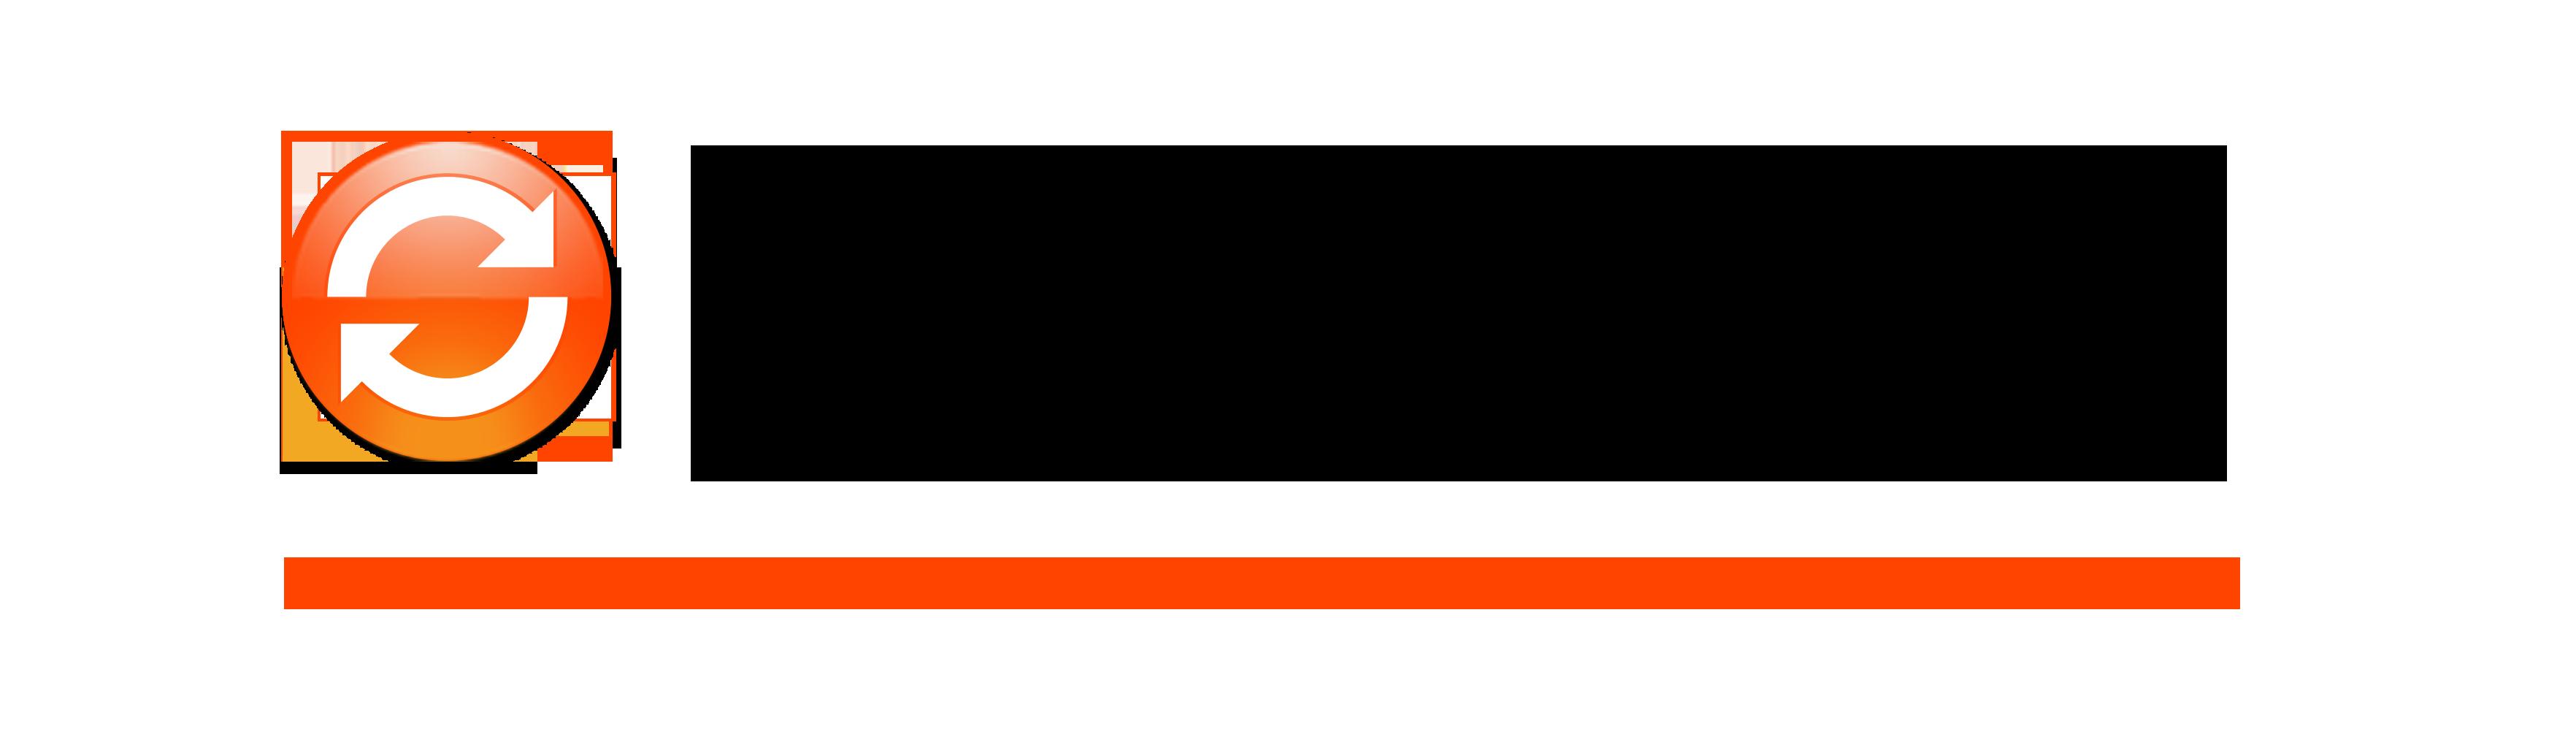 DenyAll Web Application Firewall (LTS)